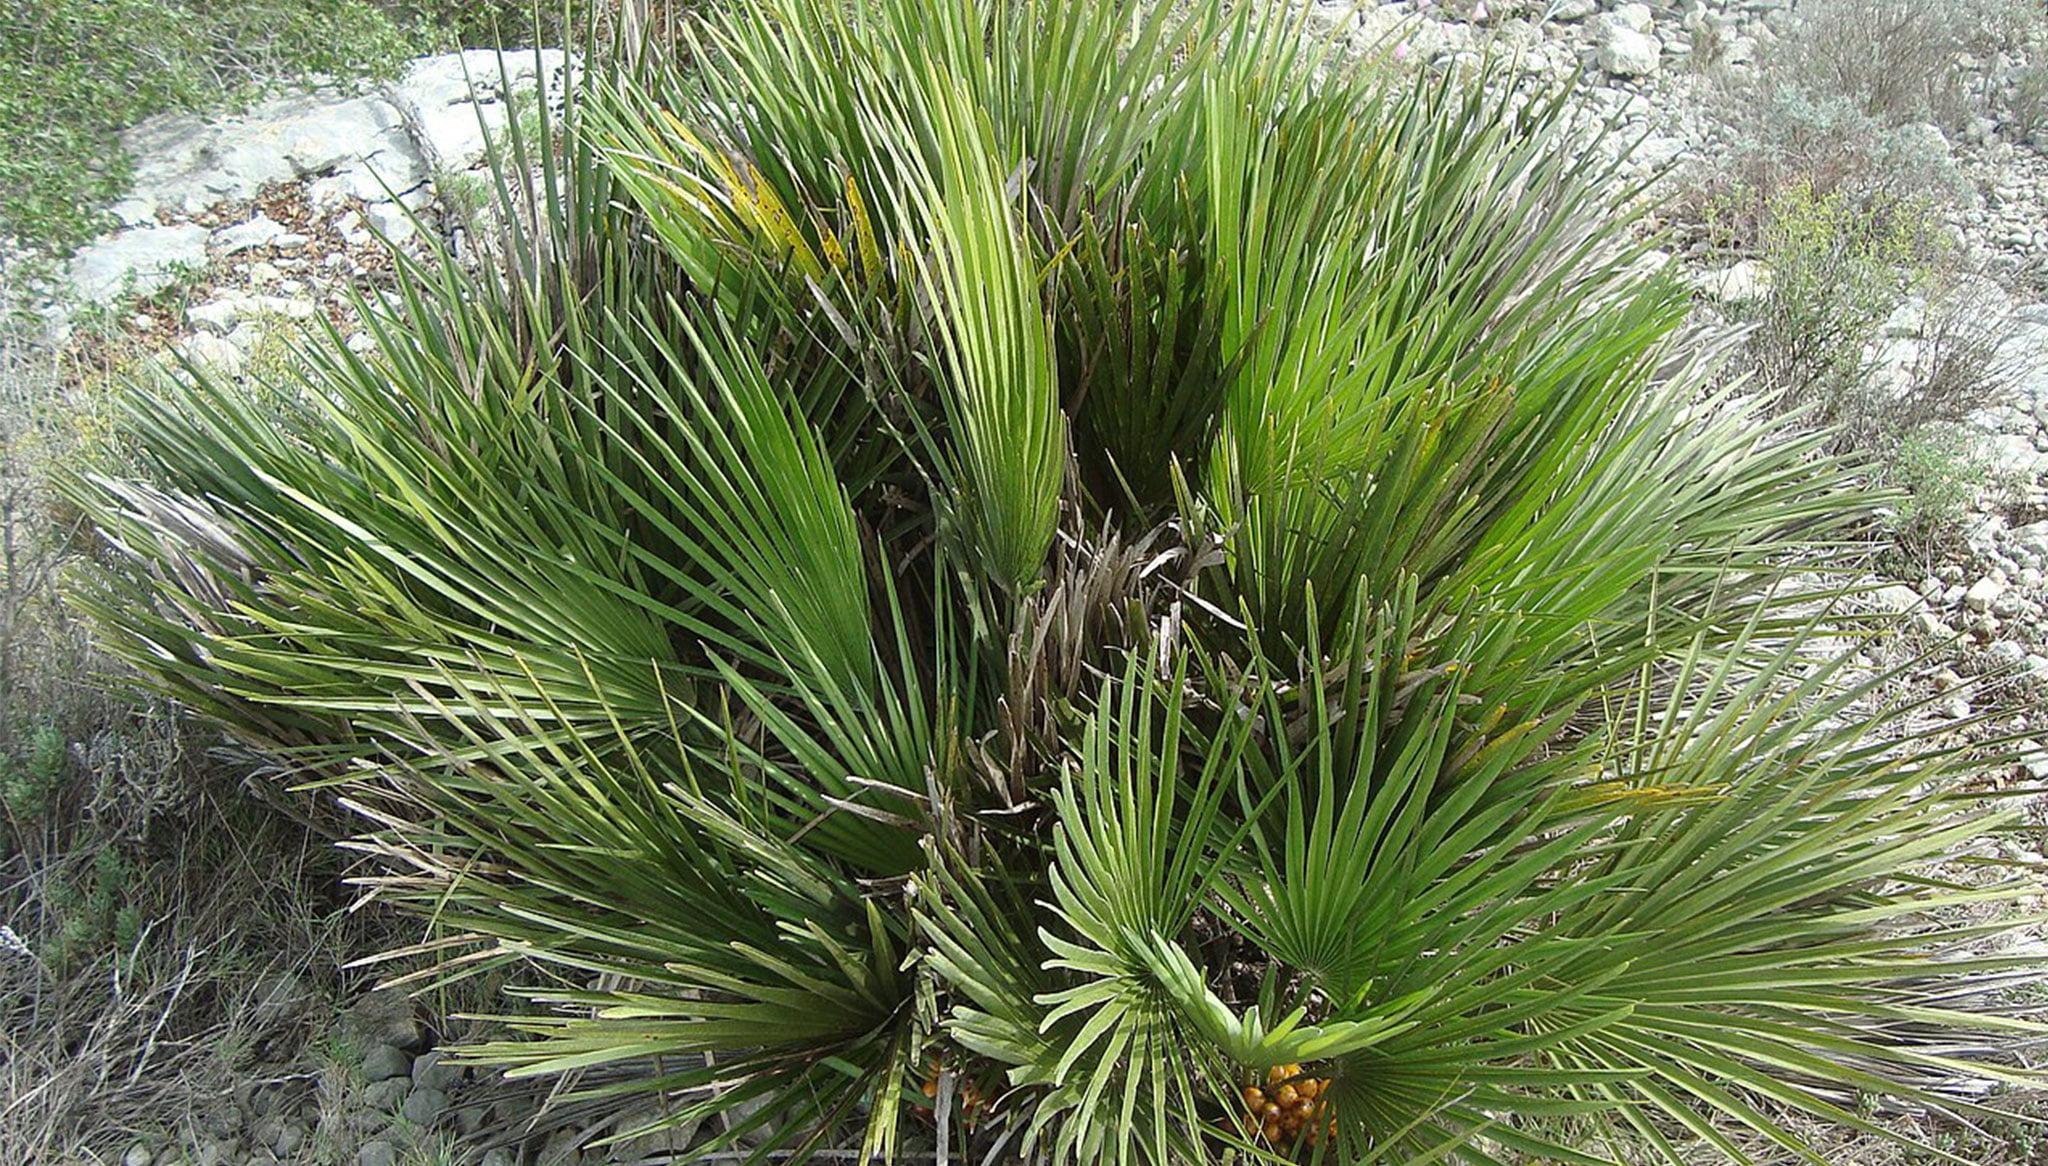 Palmito (Chamaerops humilis) Fuente: Wikimedia Commons